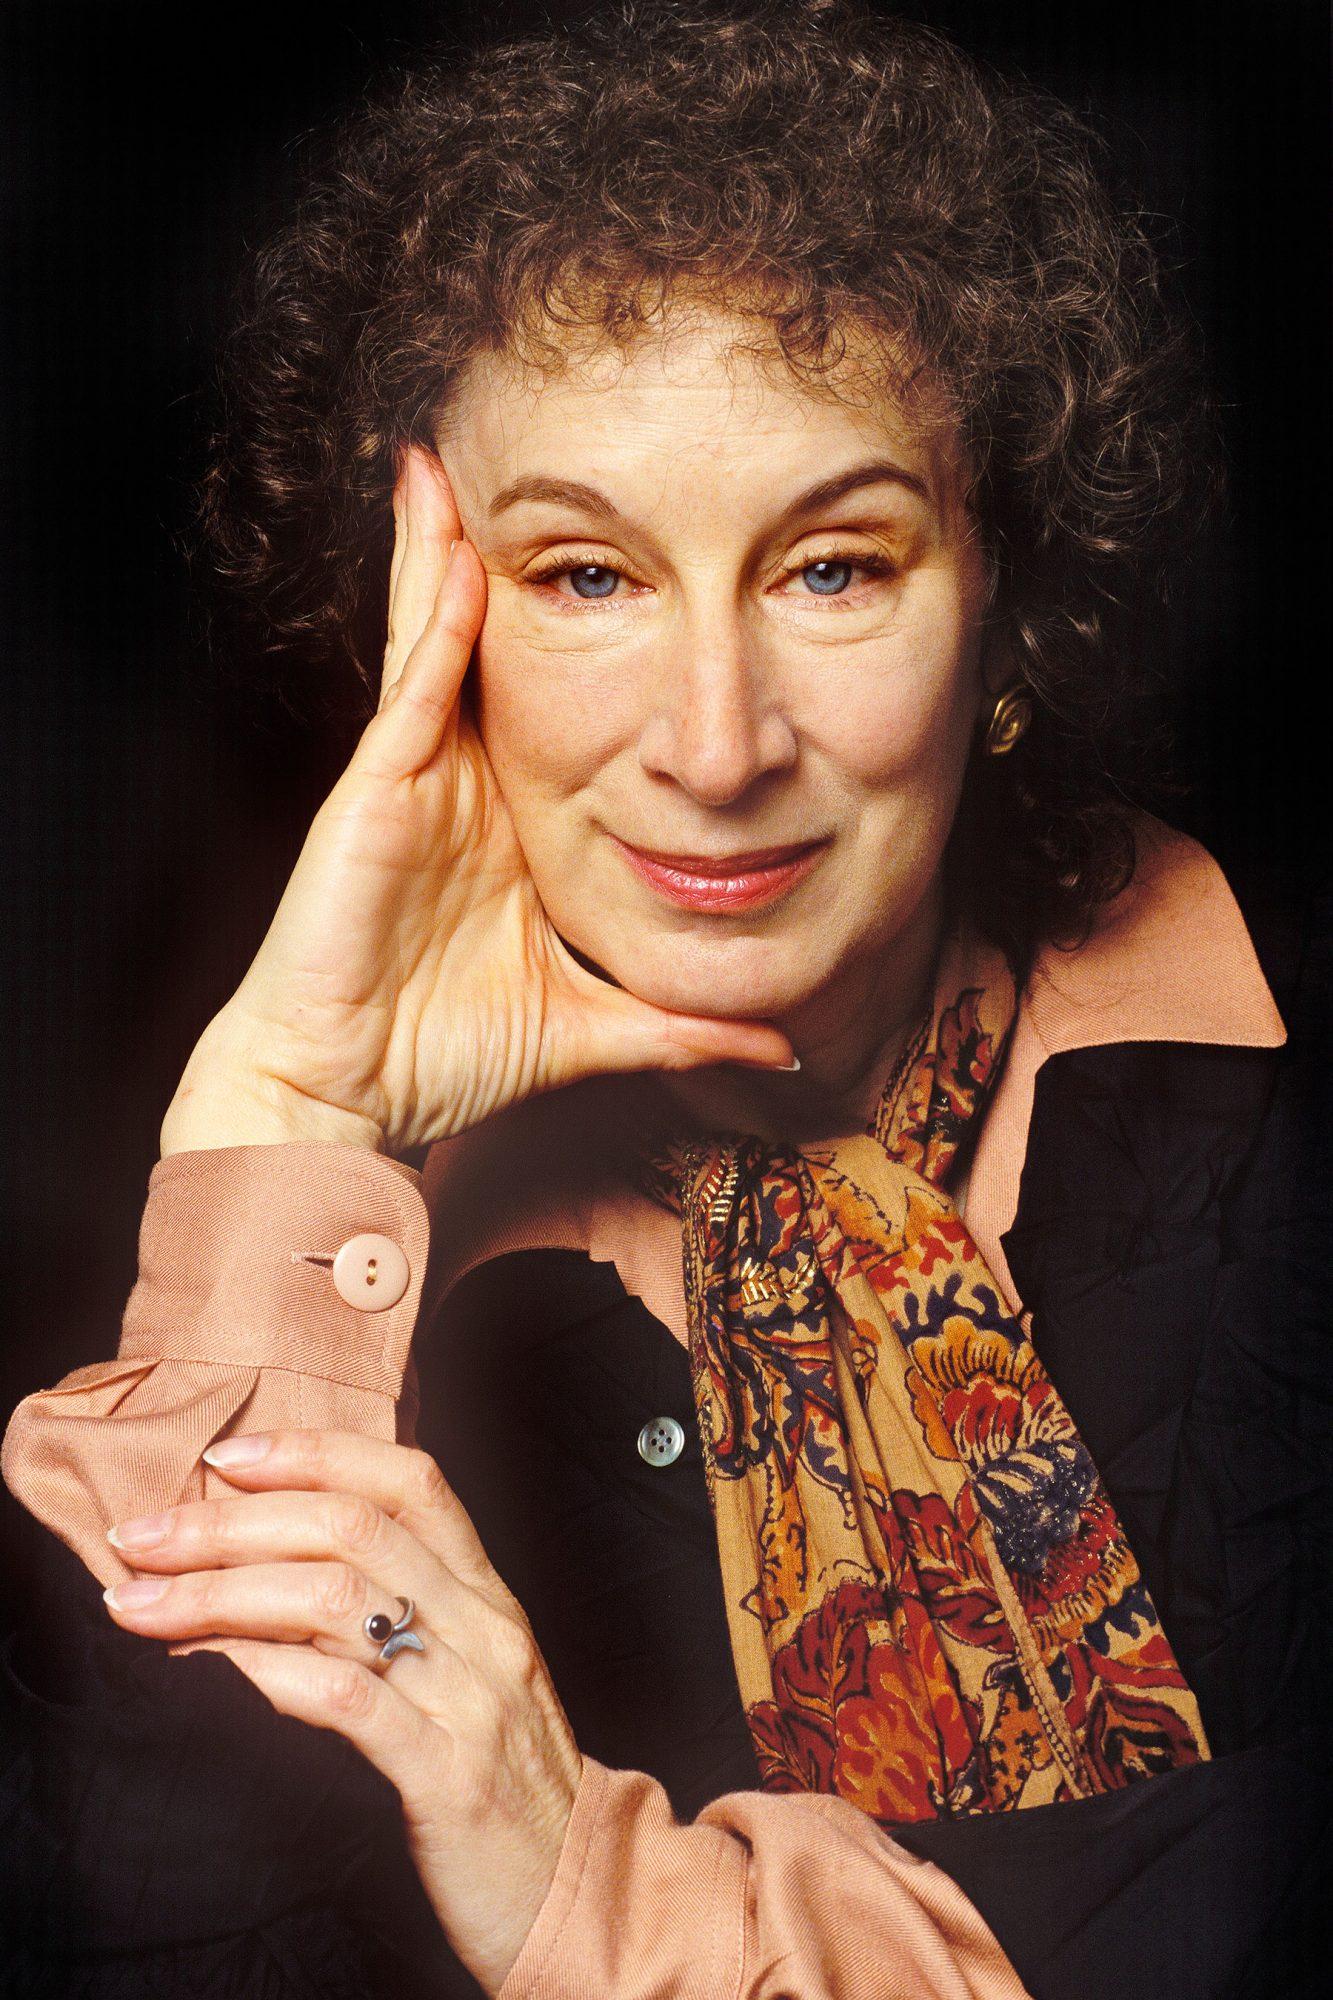 Ulf Andersen Portraits - Margaret Atwood